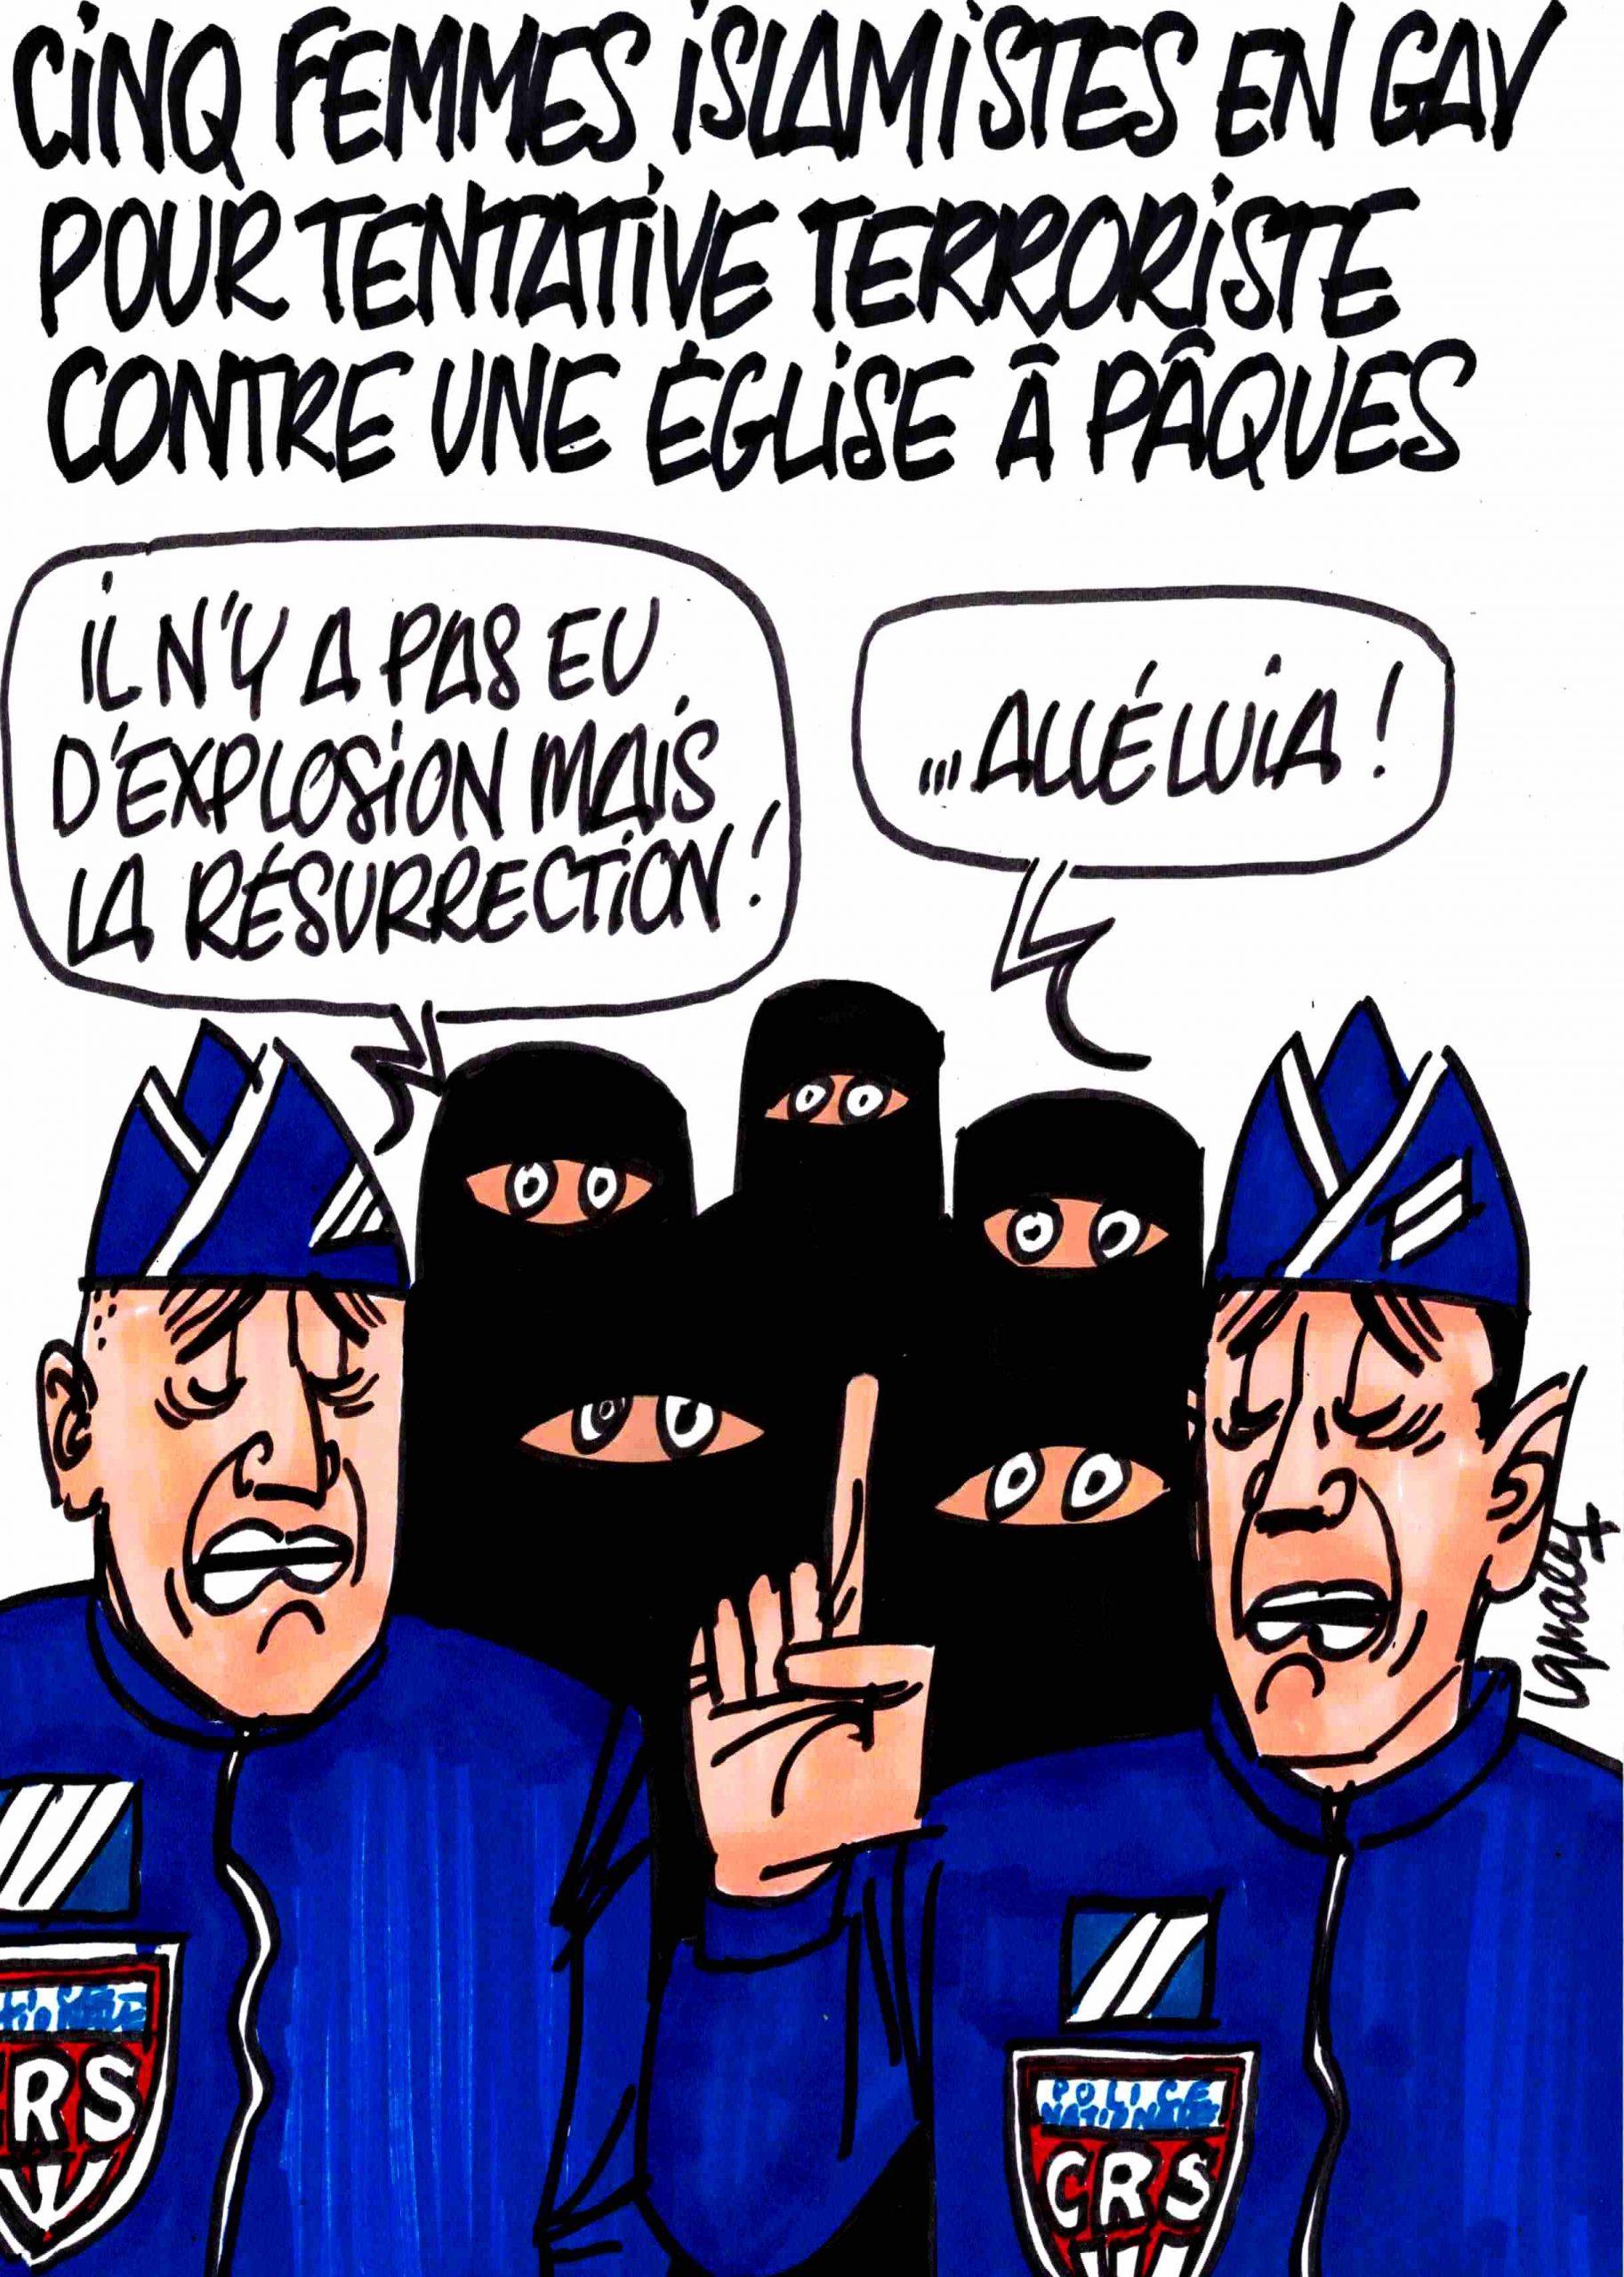 Ignace - Femmes islamistes en garde à vue